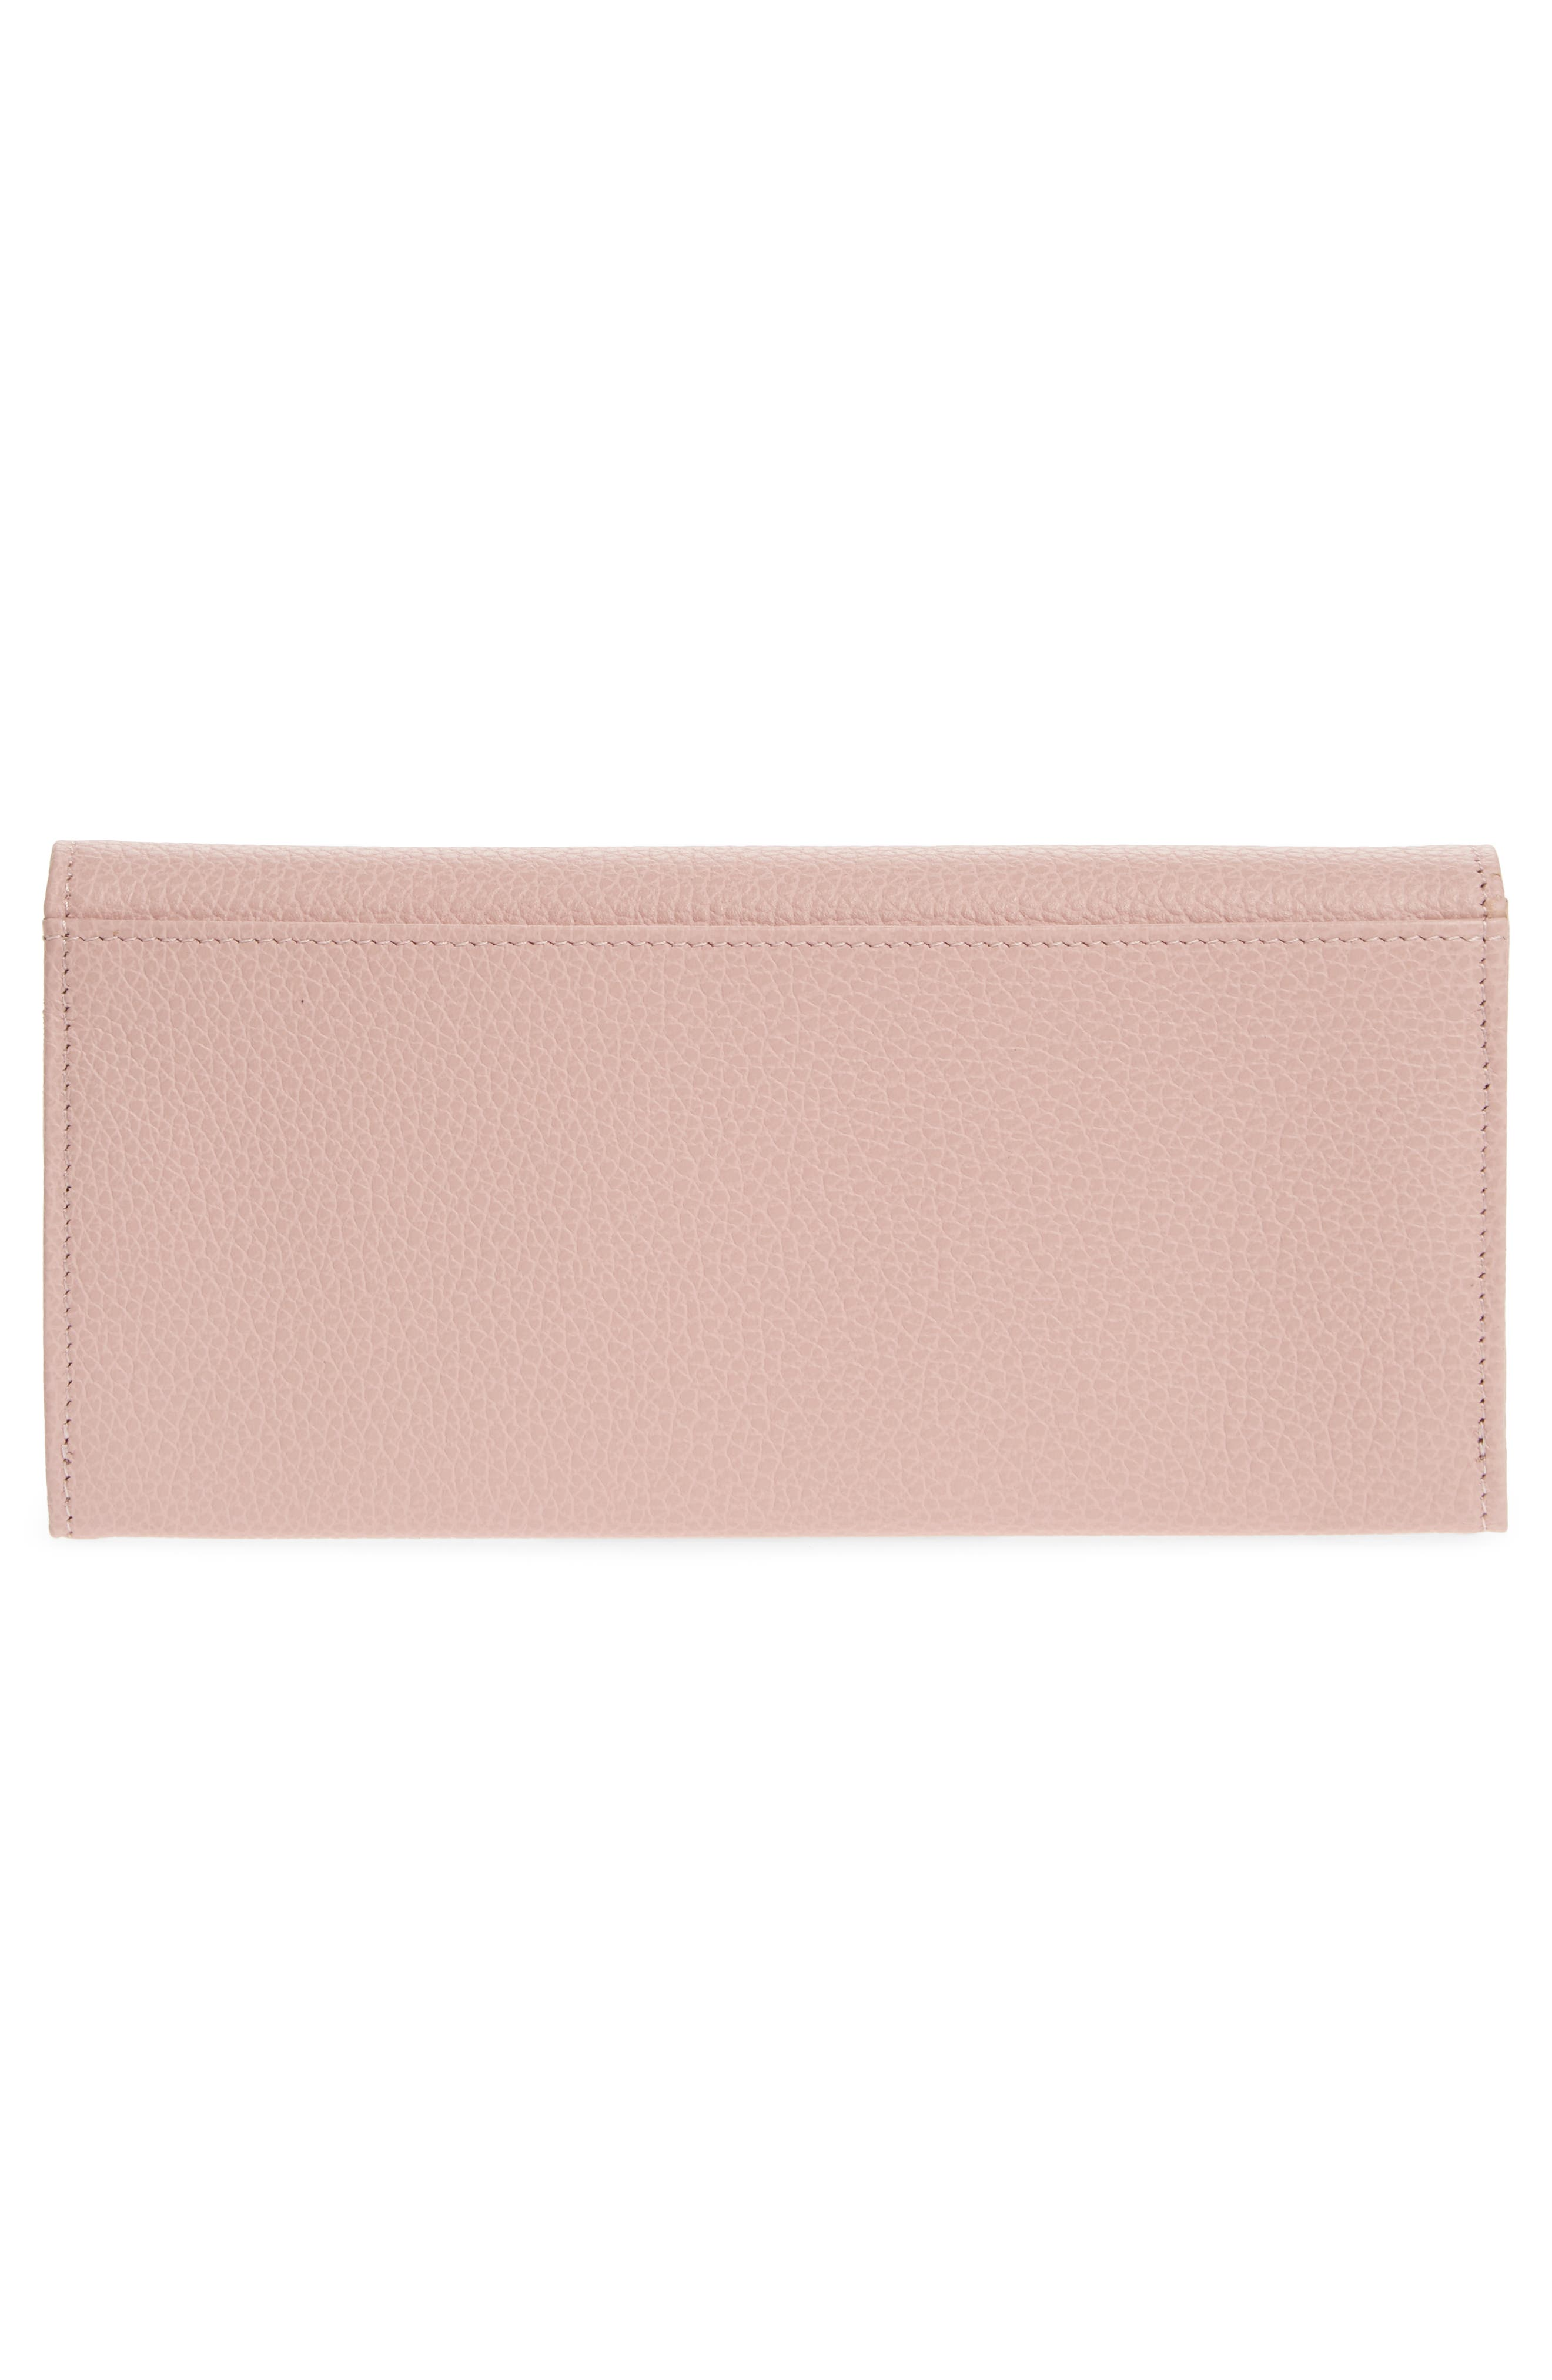 'Veau' Continental Wallet,                             Alternate thumbnail 4, color,                             Powder